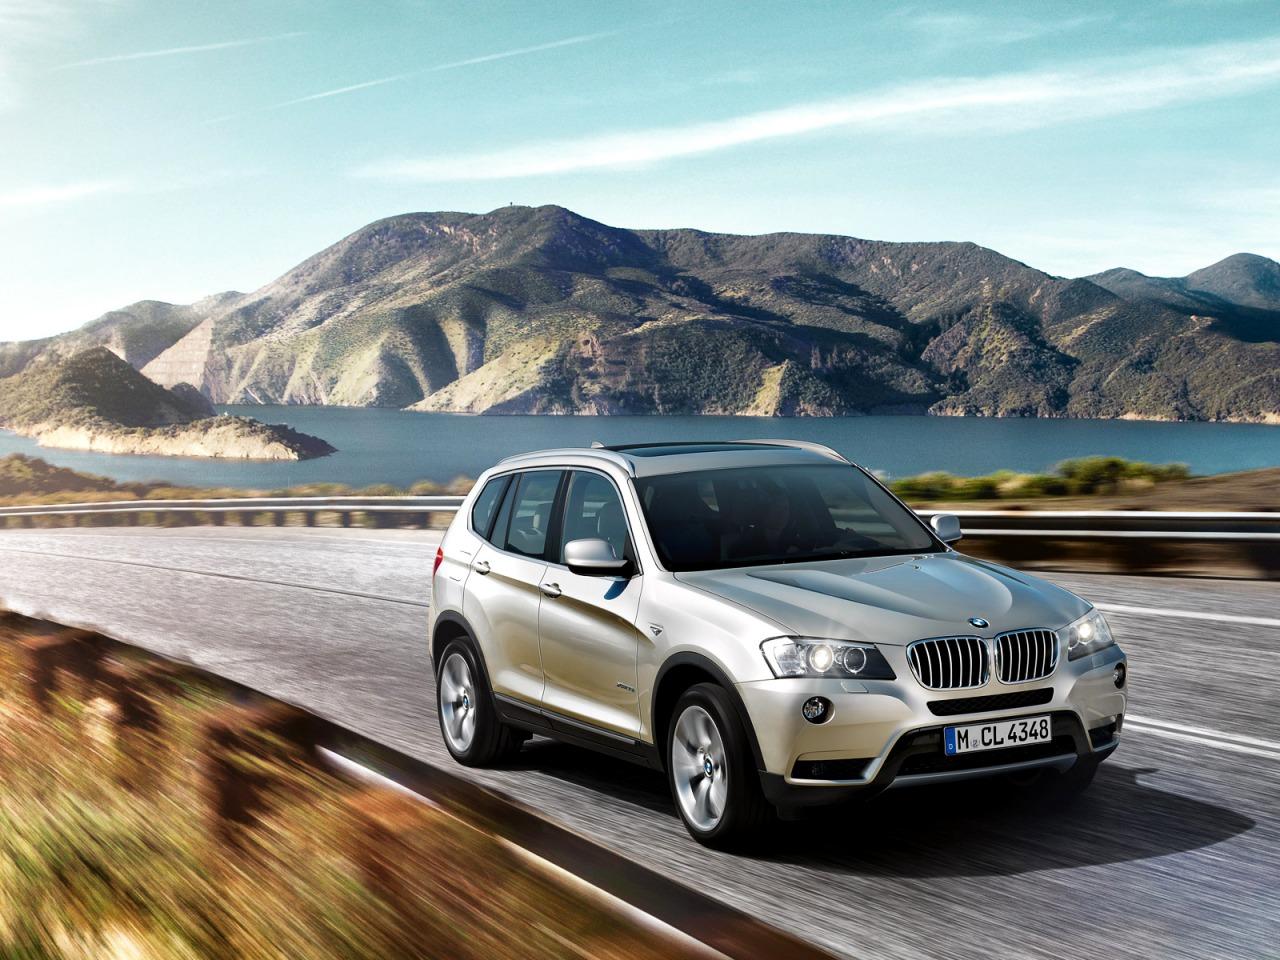 Luxury Car Wallpapers: 2011 BMW X3